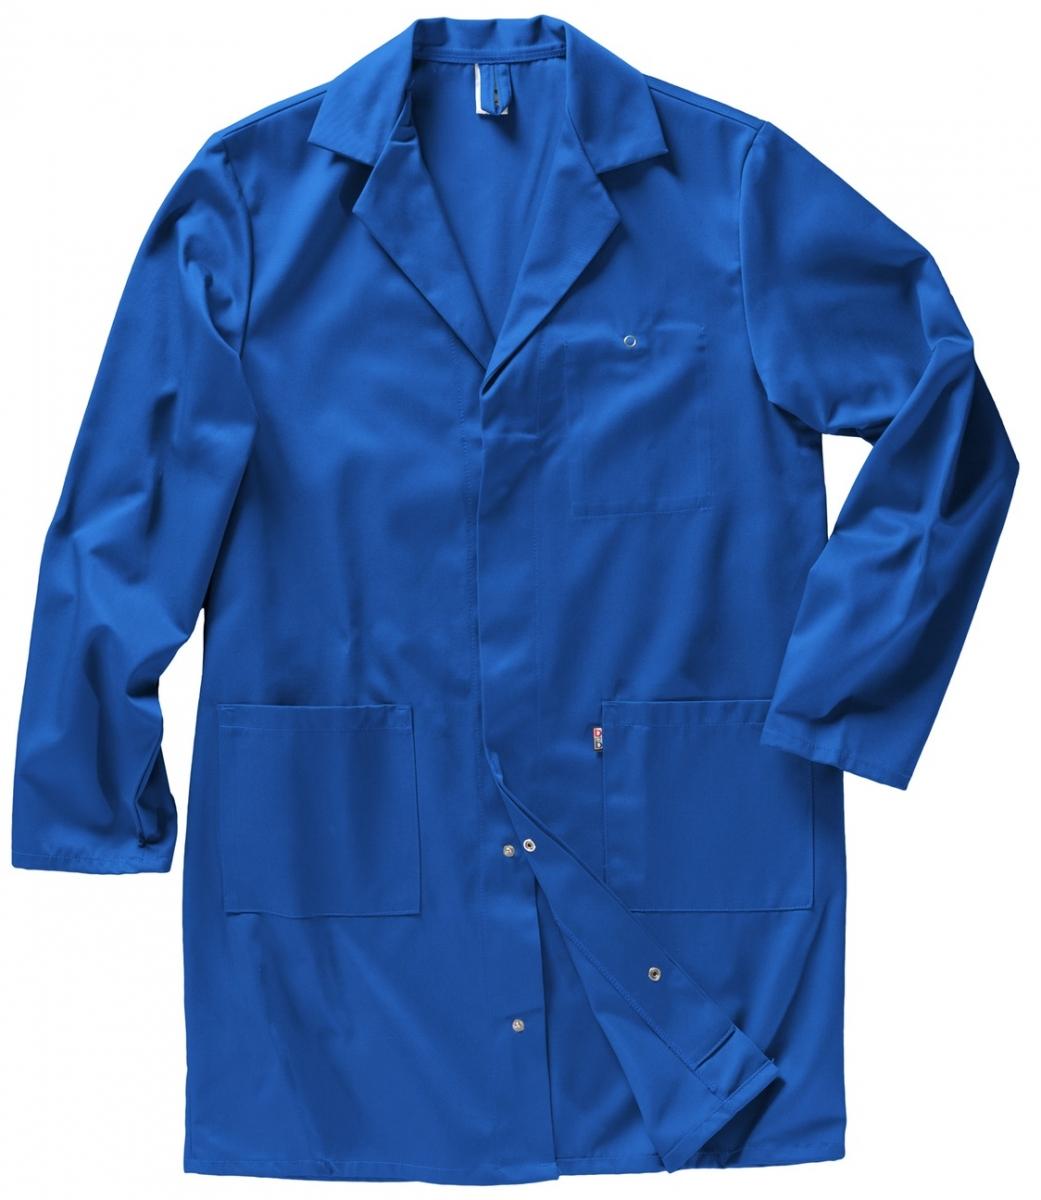 BEB-Basic-Herren-Berufs-Mantel, Arbeits-Kittel, Basic, MG 245, kornblau